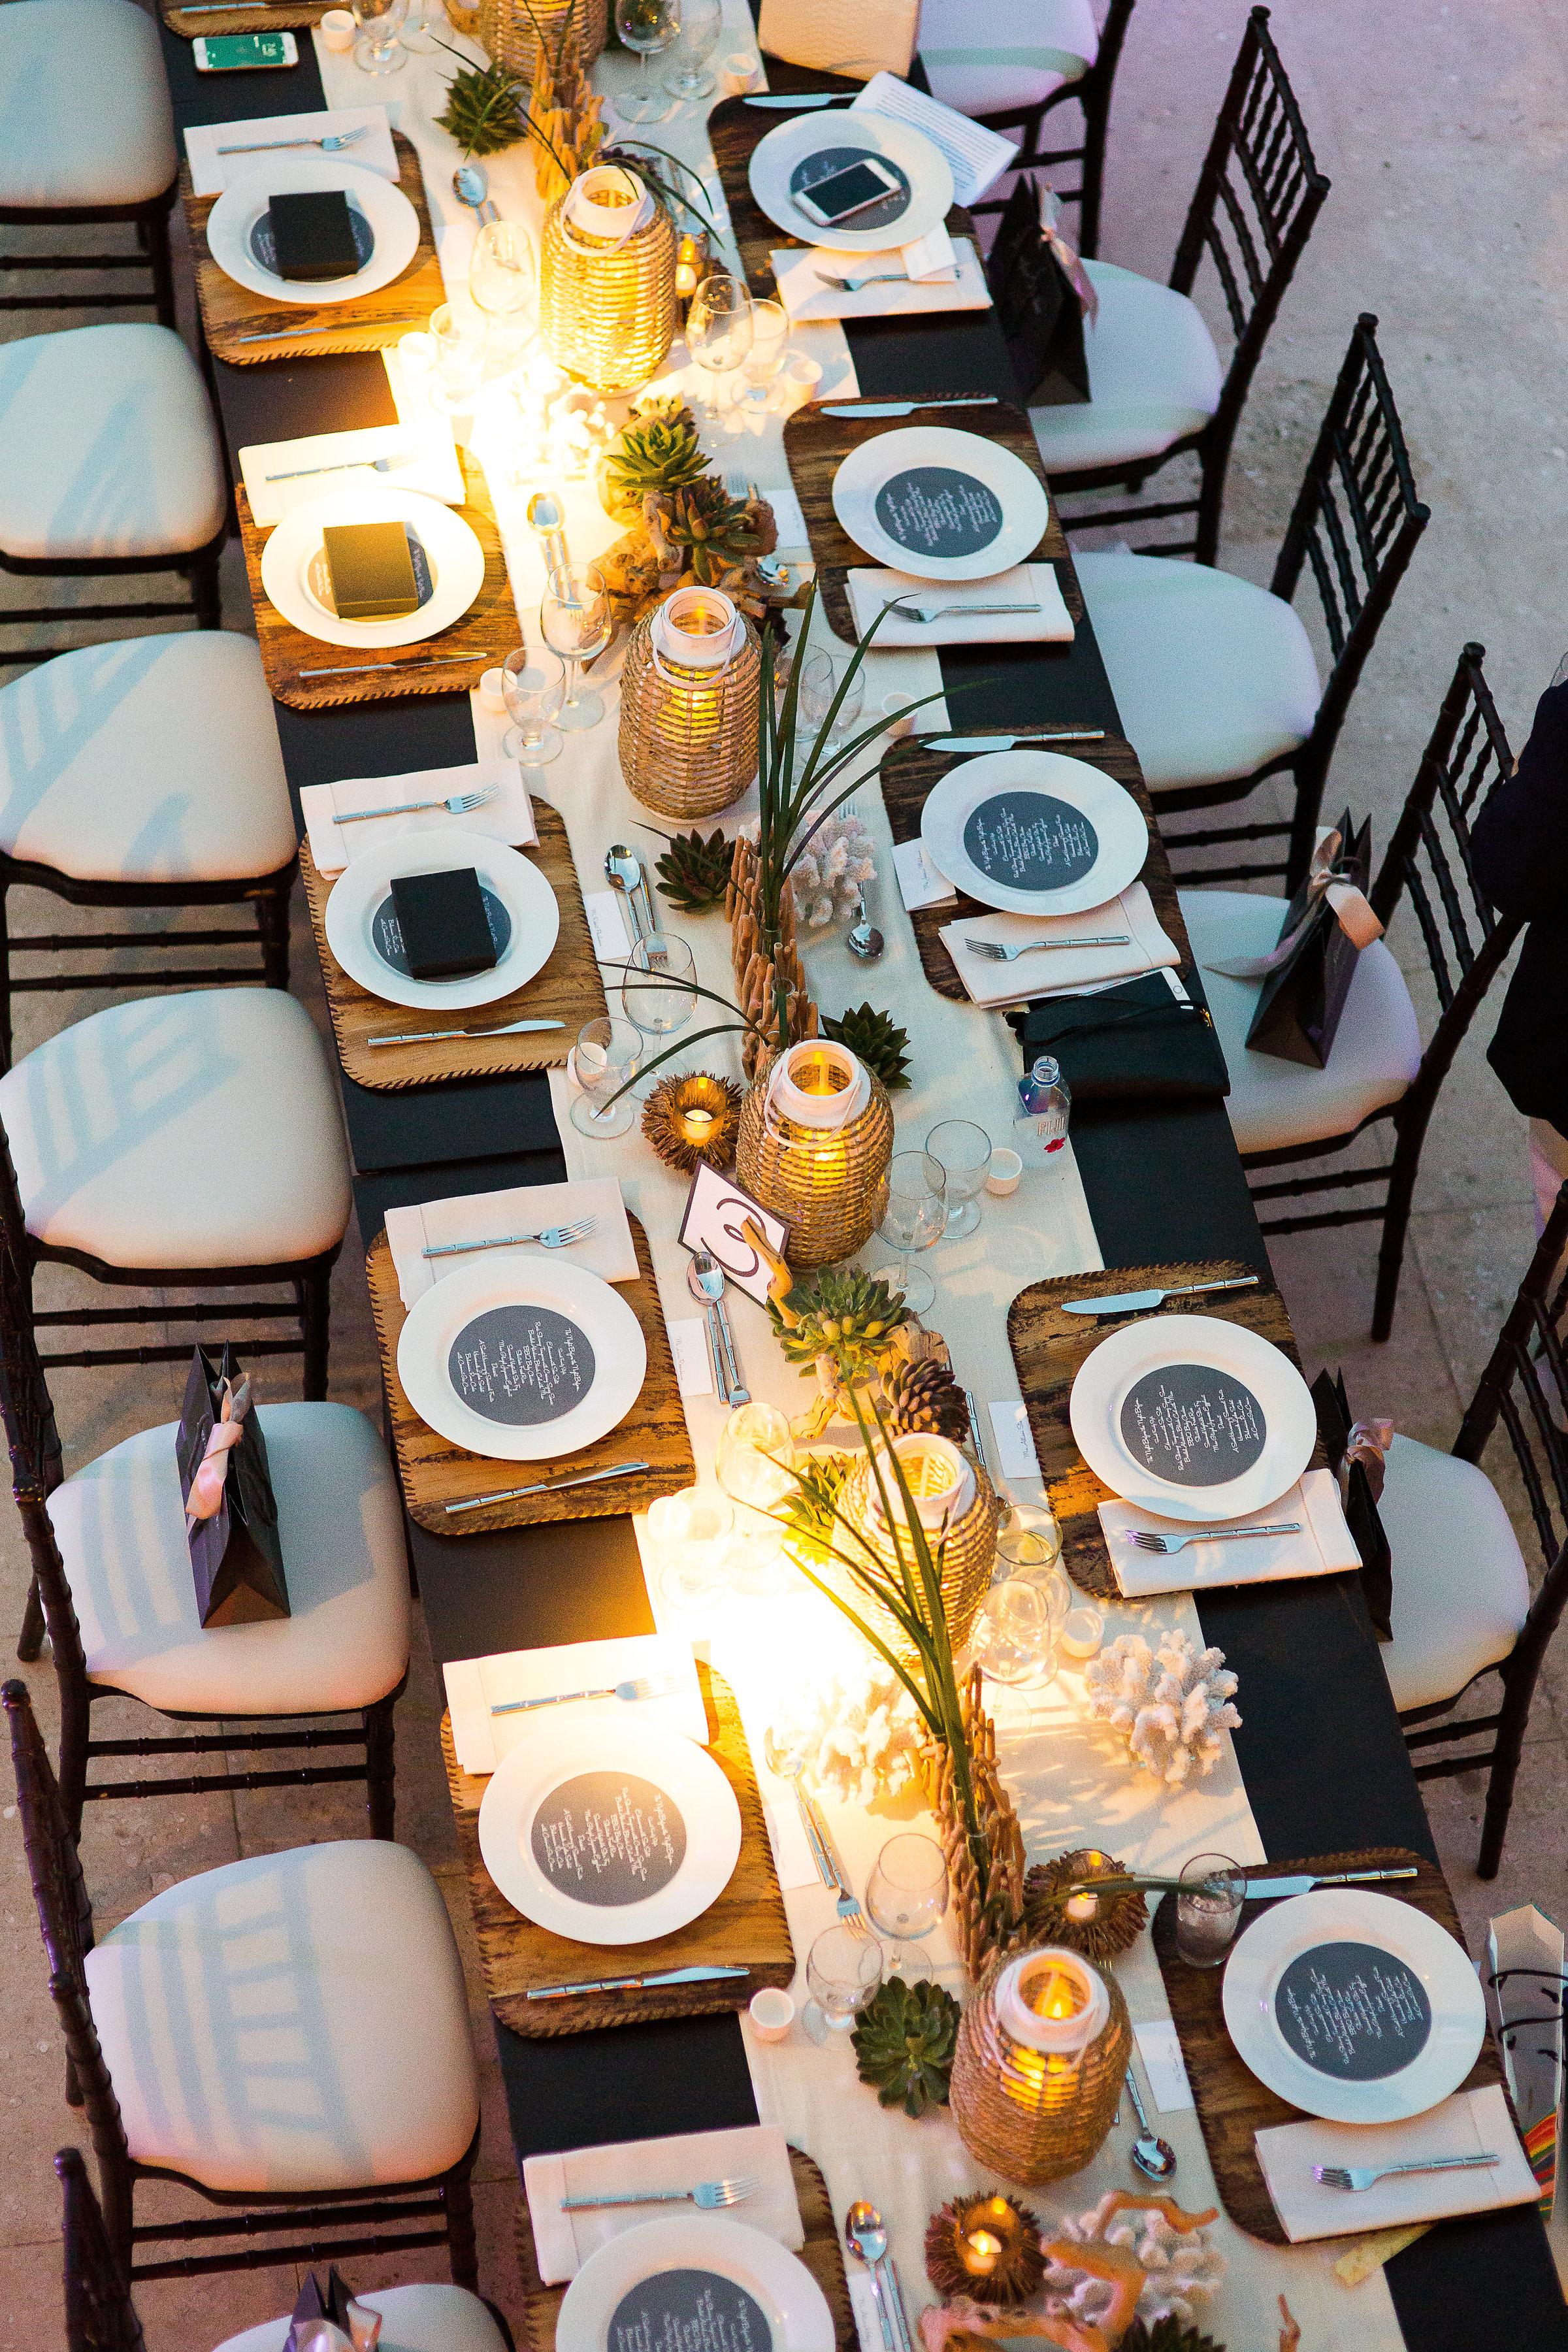 Ceci_New_York_Ceci_Style_Ceci_Johnson_Luxury_Lifestyle_Destination_Bahamas_Wedding_Letterpress_Inspiration_Design_Custom_Couture_Personalized_Invitations_18.jpg